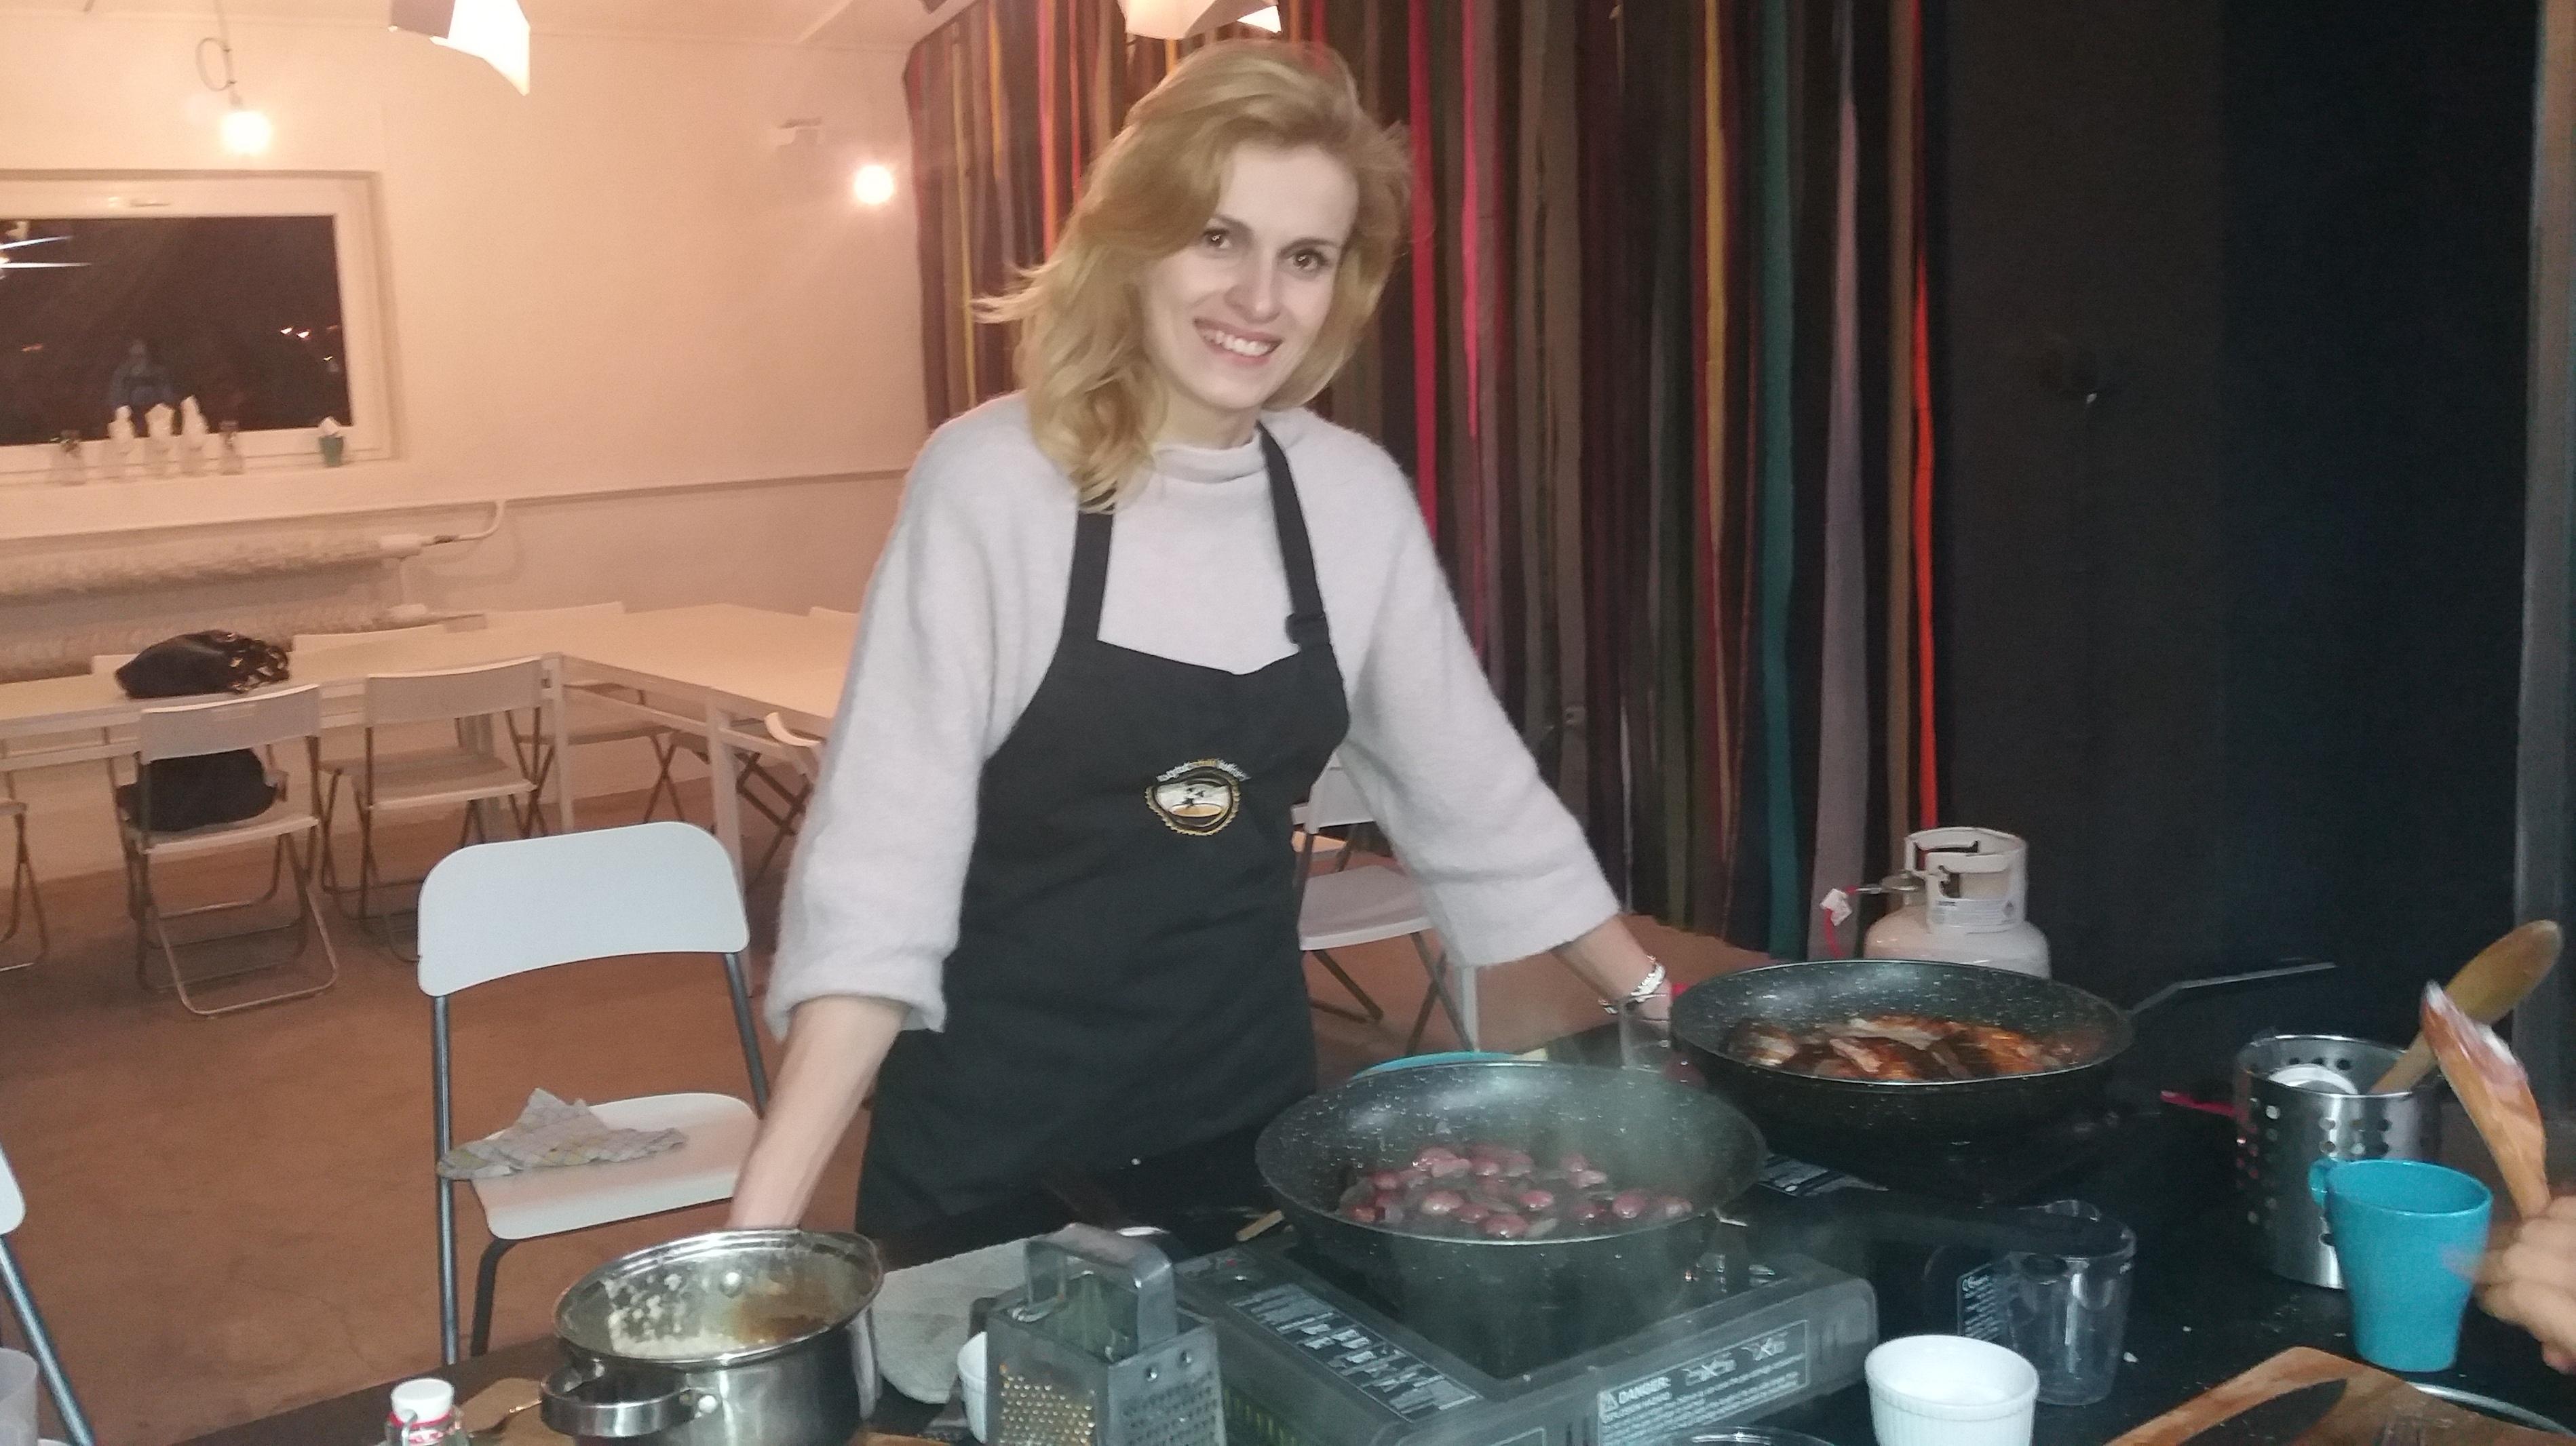 warsztaty kulinarne warszawa Justyna Mizera